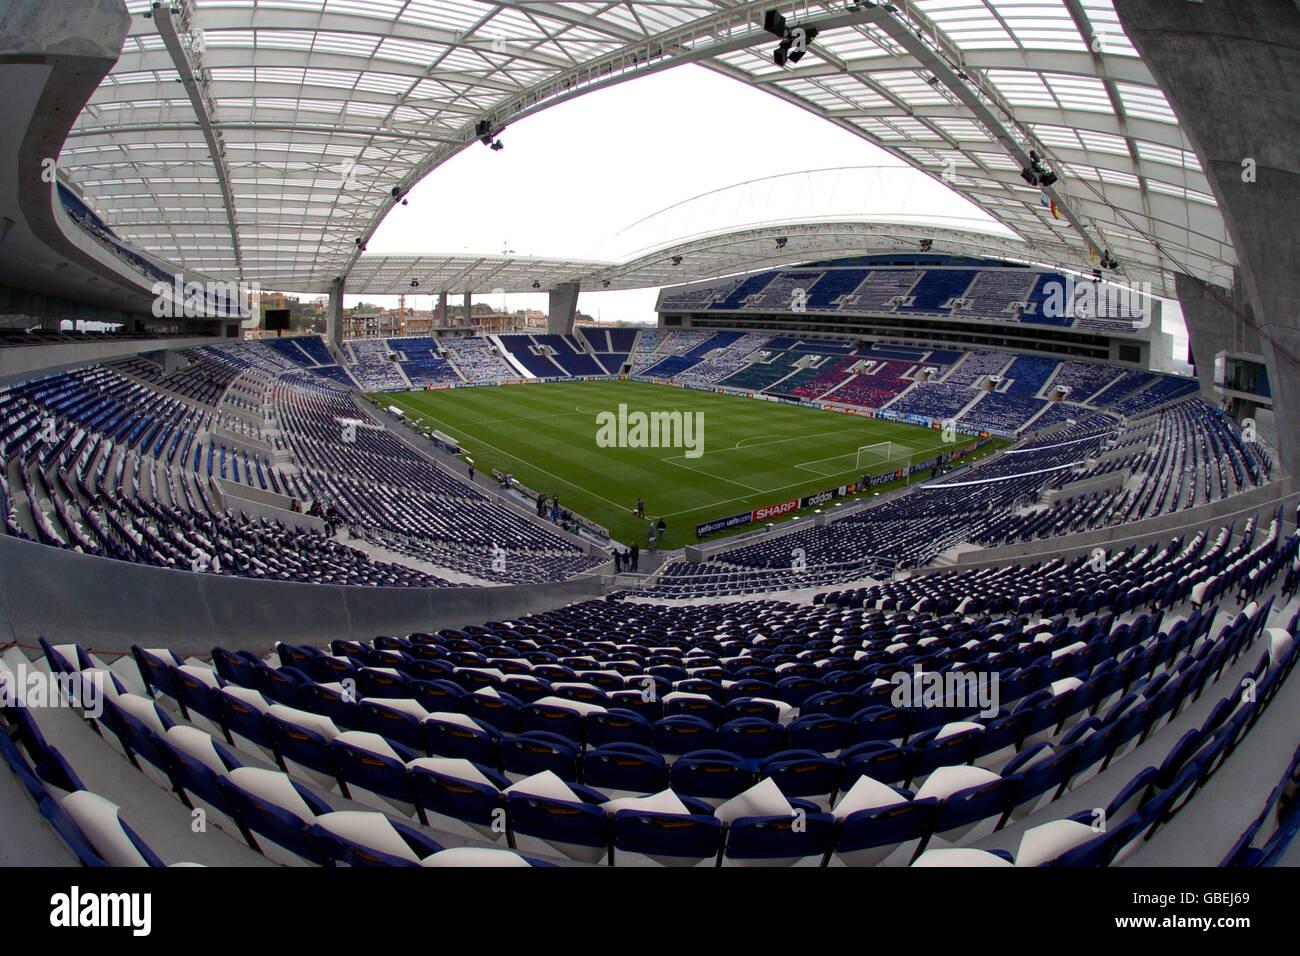 Porto Fc Stadium Seating Plan - A General View Of The Dragao Stadium Home Of Fc Porto Stock Photo Alamy